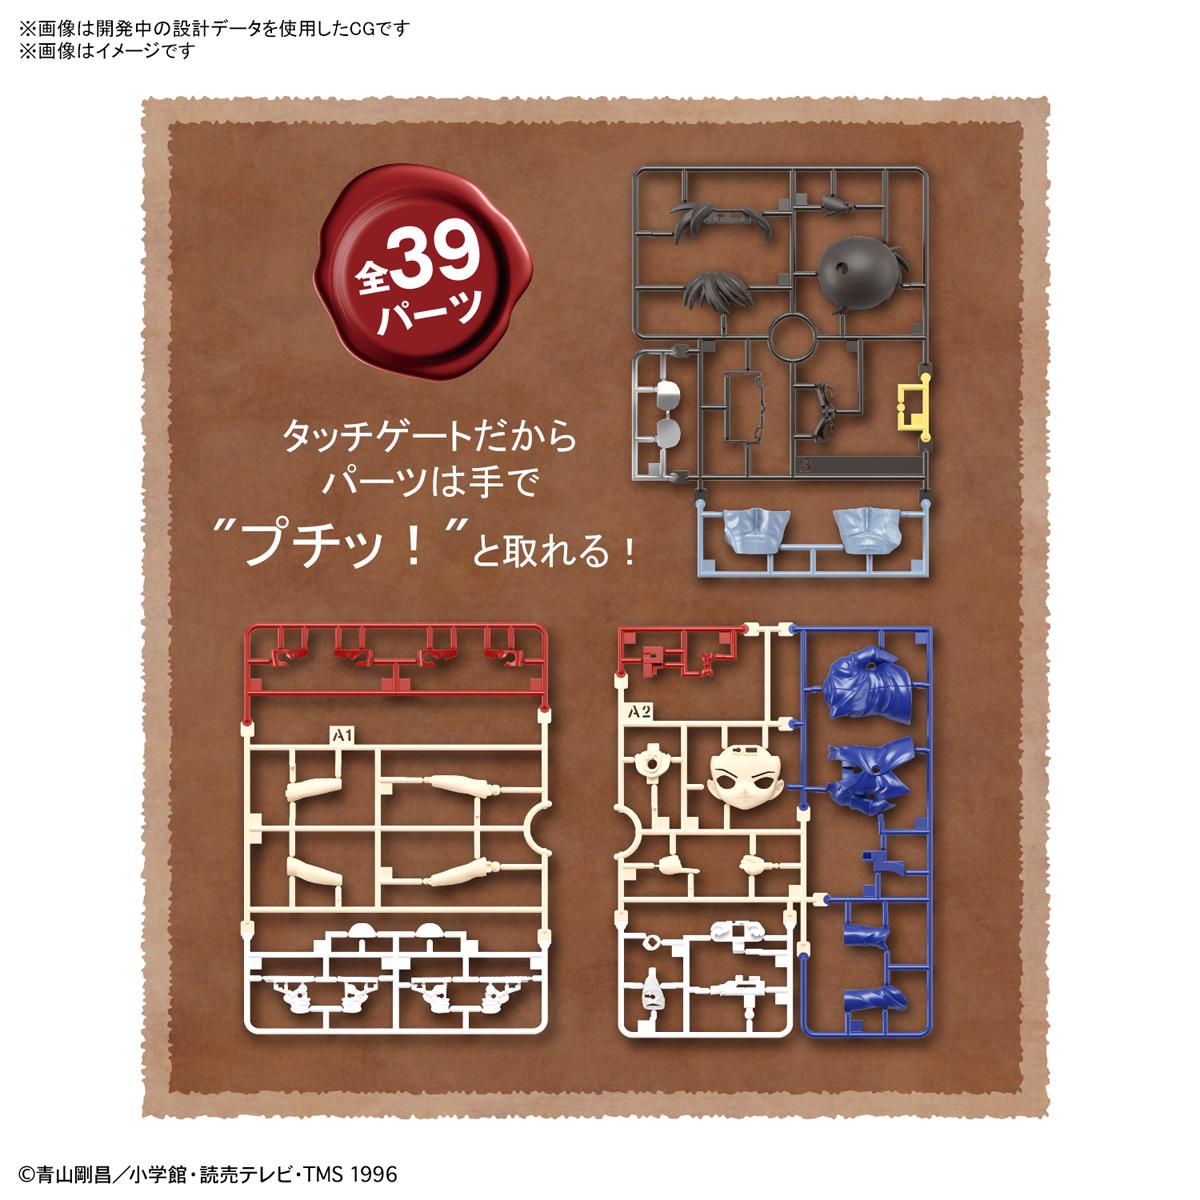 ENTRY GRADE『江戸川コナン』名探偵コナン プラモデル-005